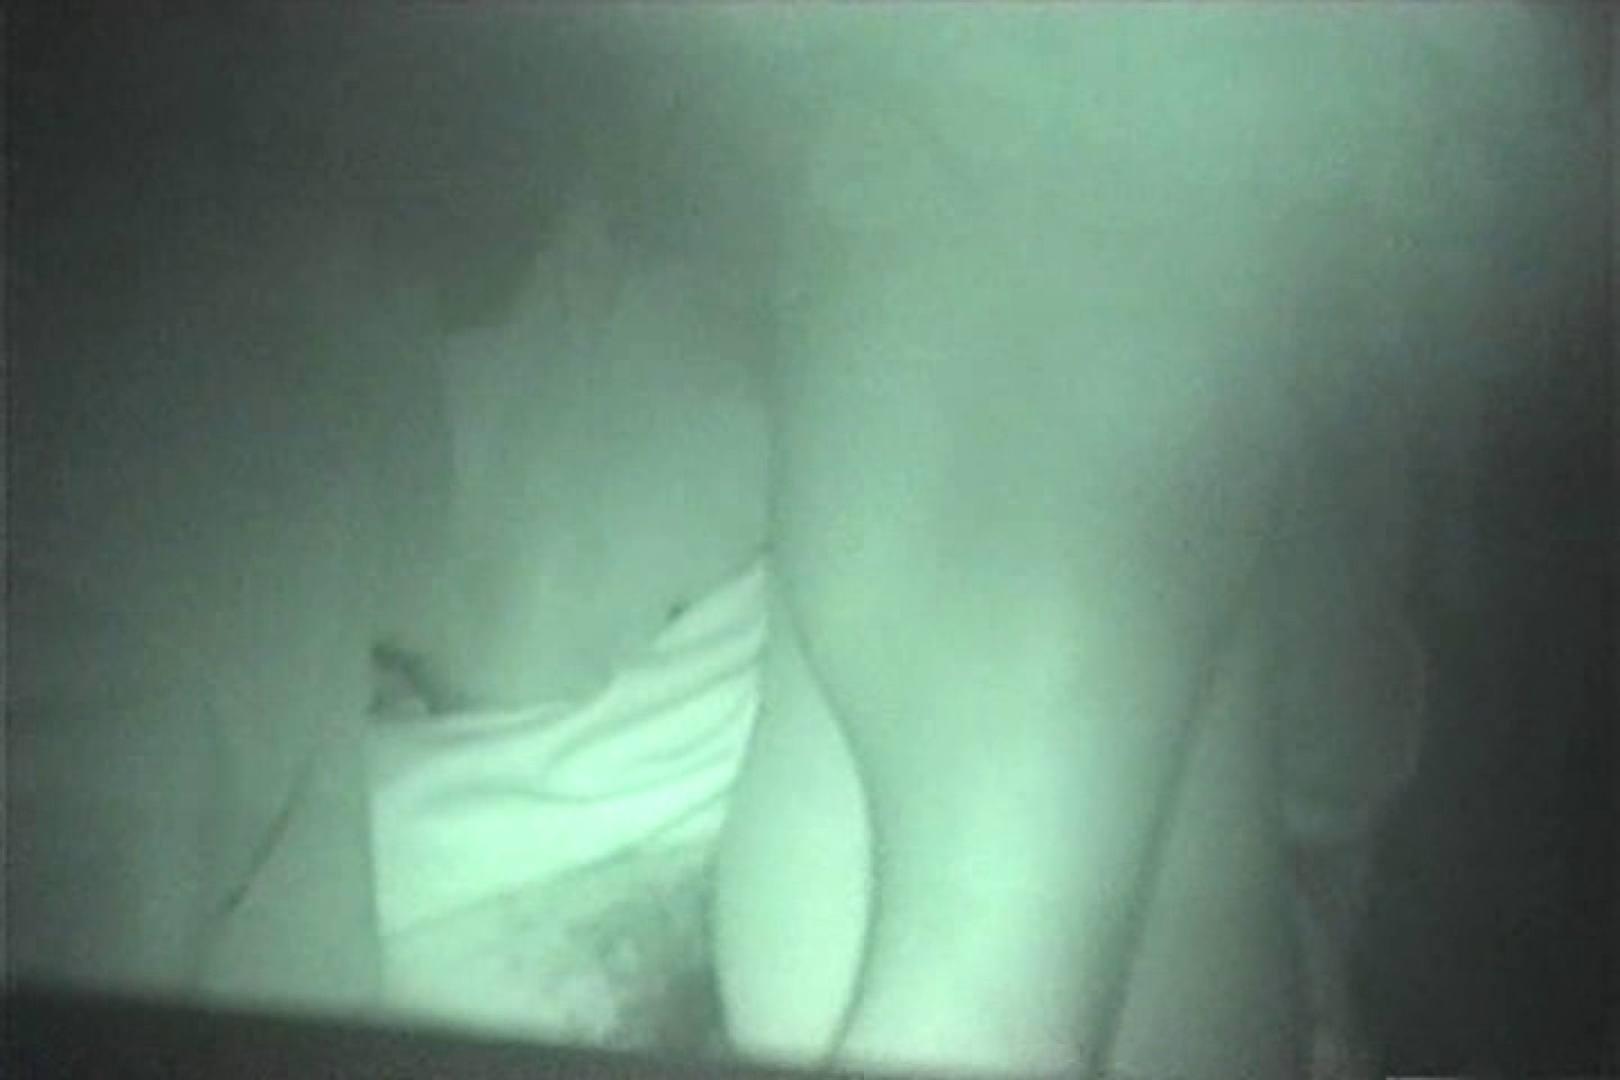 MASAさんの待ち伏せ撮り! 赤外線カーセックスVol.17 車 セックス画像 89pic 23